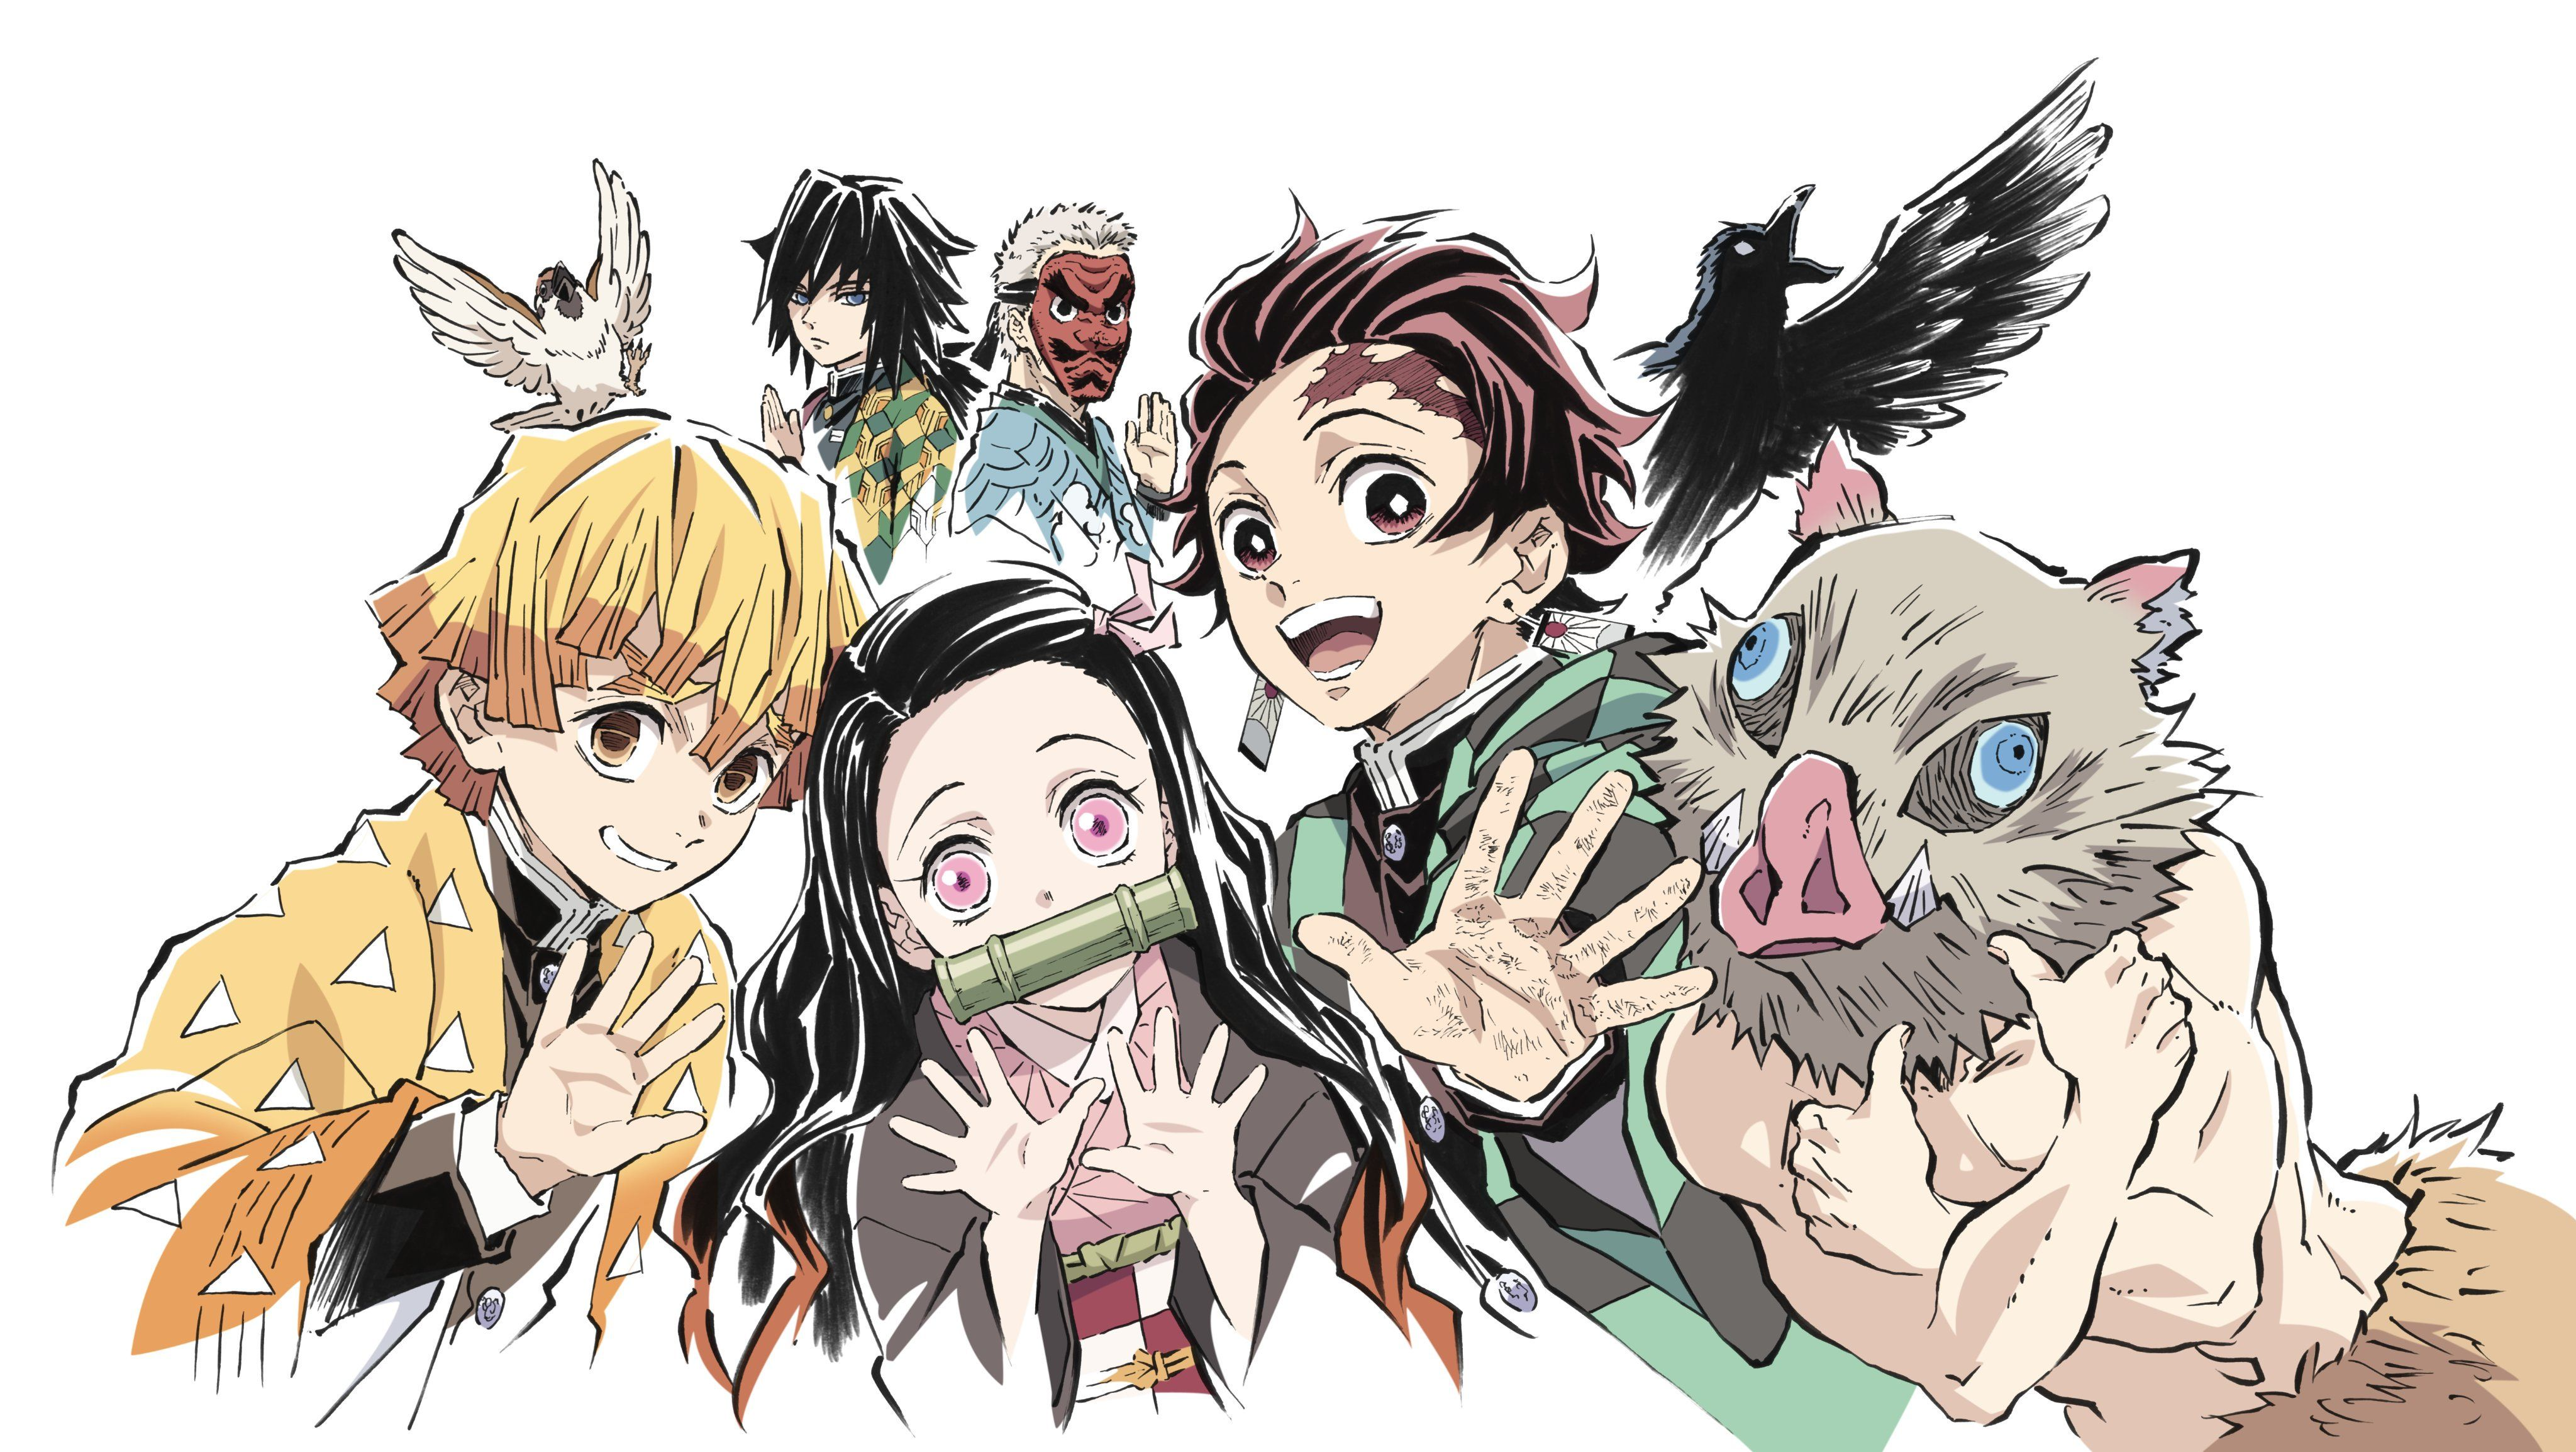 Ps4 Anime Girl Demon Slayer Wallpapers - Wallpaper Cave